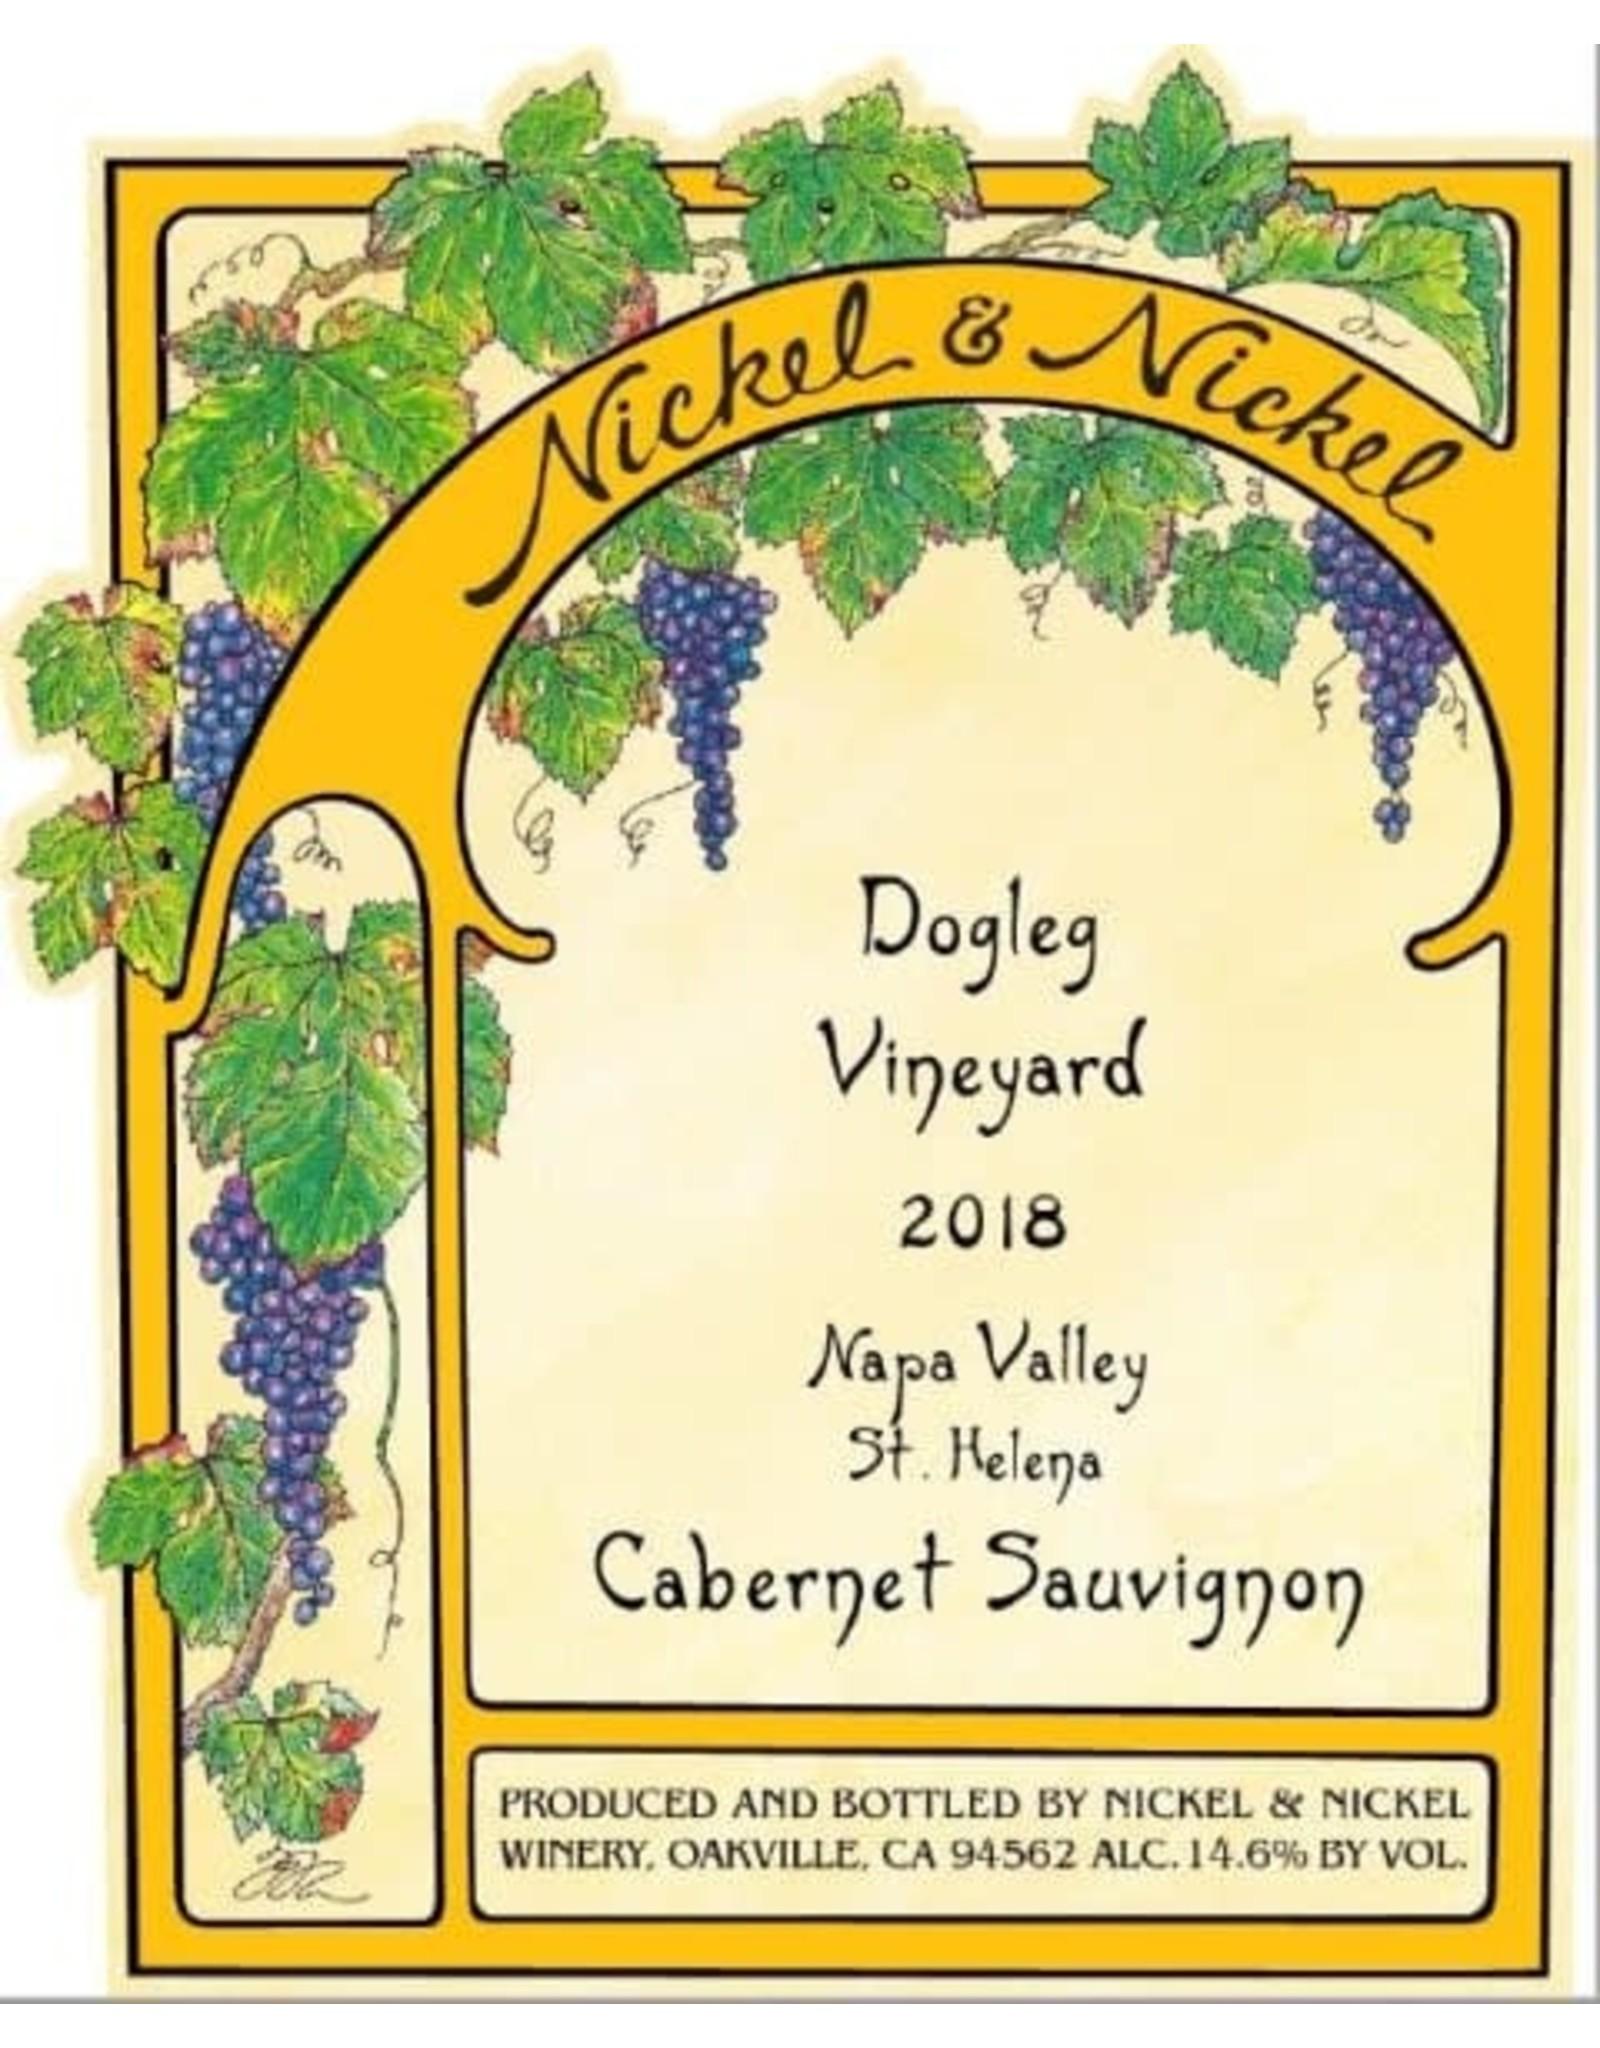 Nickel & Nickel Dogleg Vineyard Cabernet Sauvignon 2018